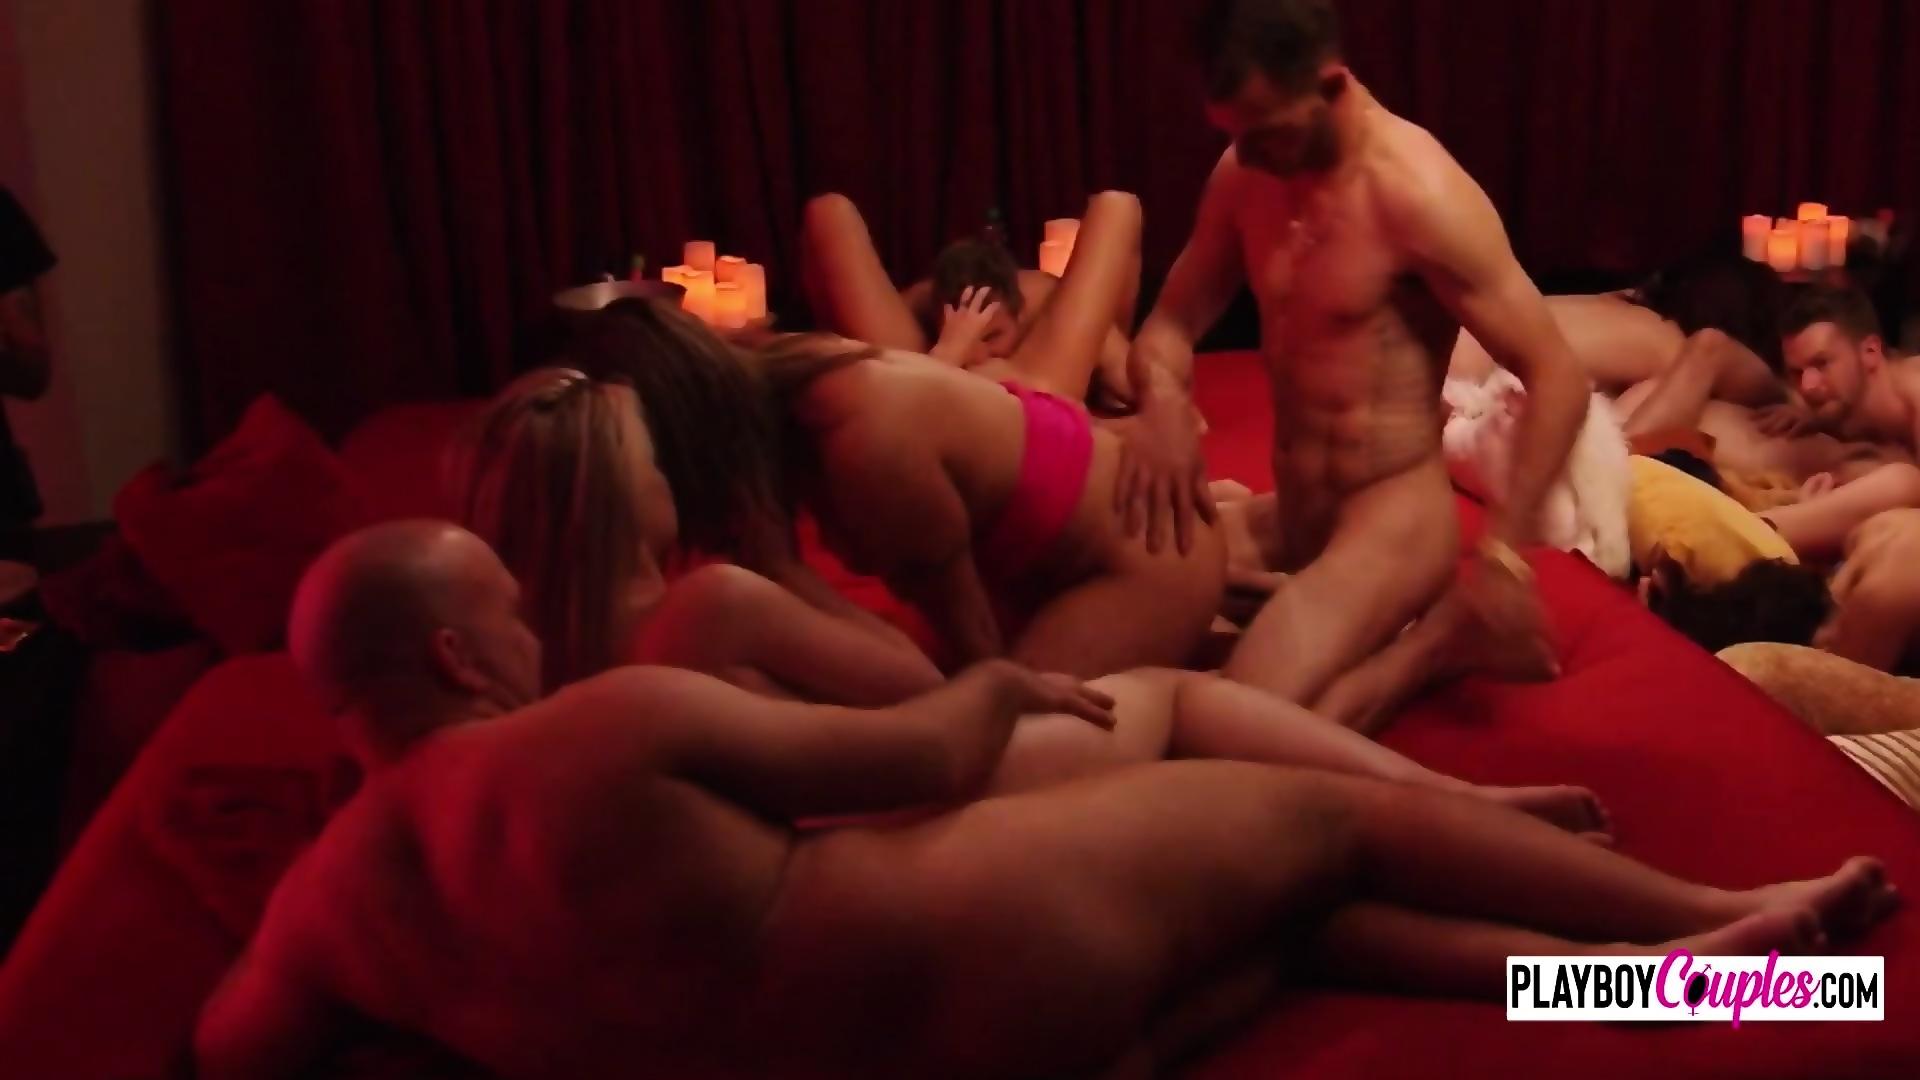 Sexymilf deauxma free porn pics